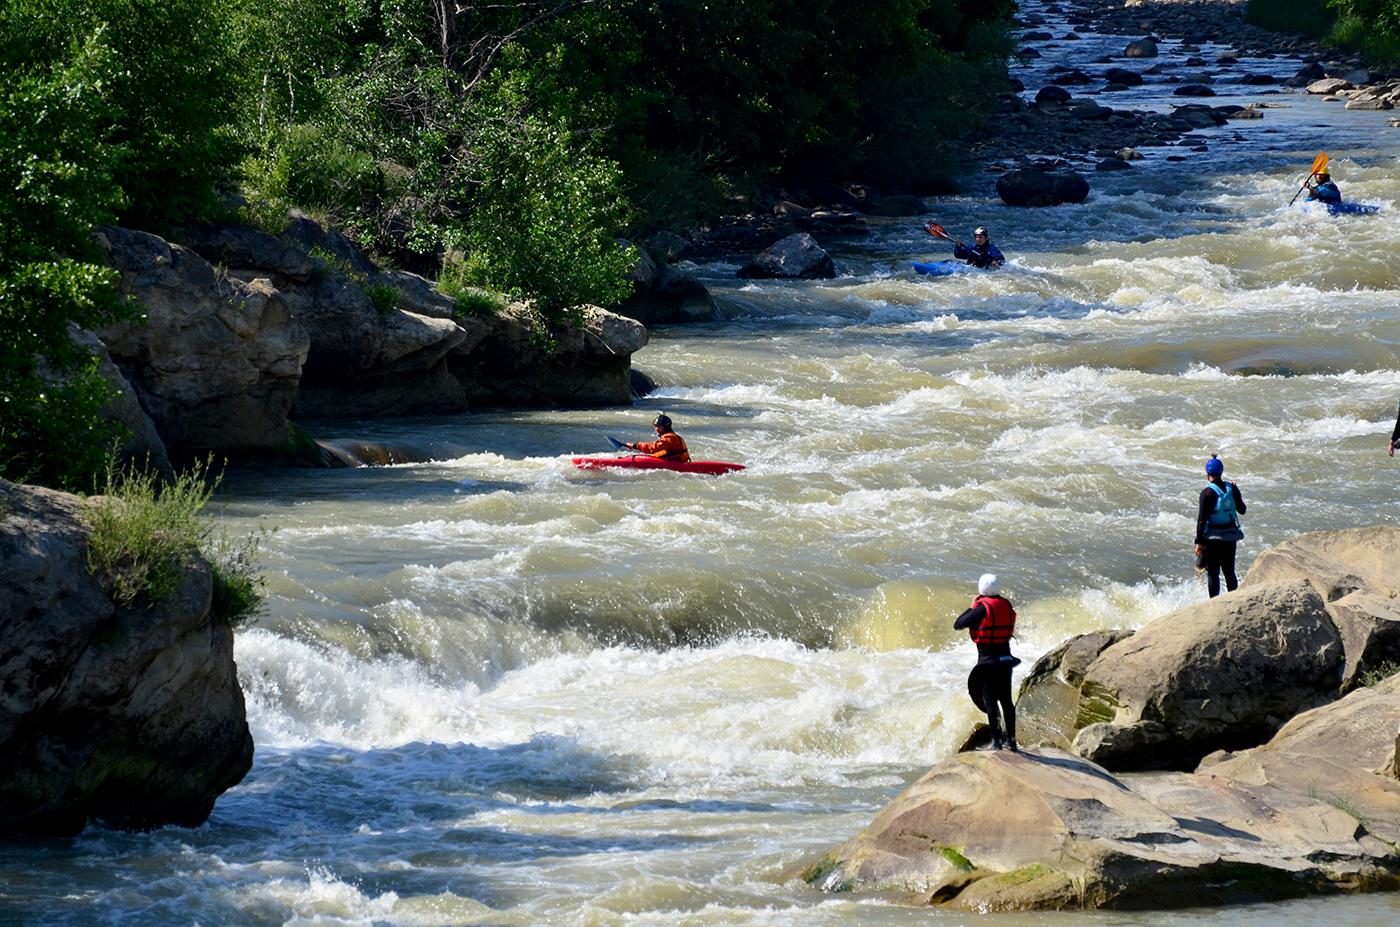 река Жиу, Румъния